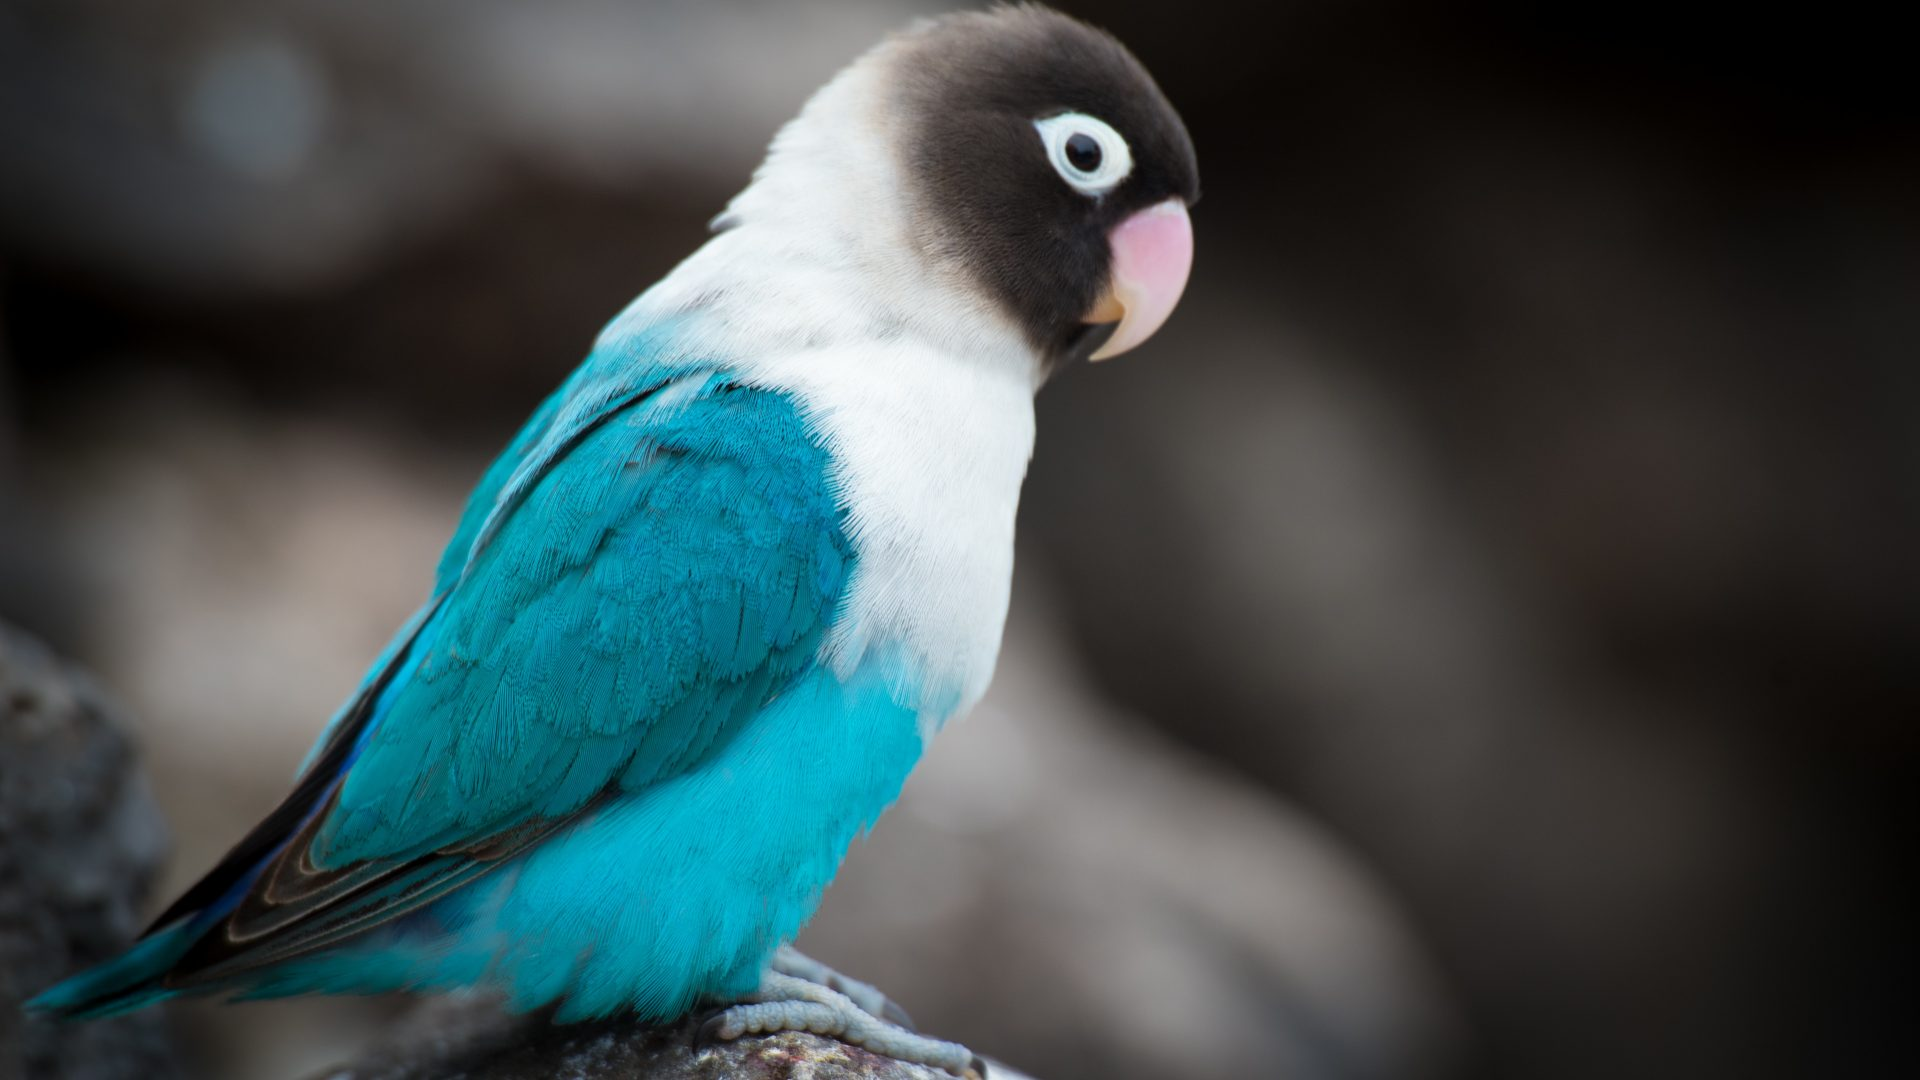 Iphone 5s Wallpaper Hd Blue Parrot Wallpaper 4k 5k Hd Wallpaper Background